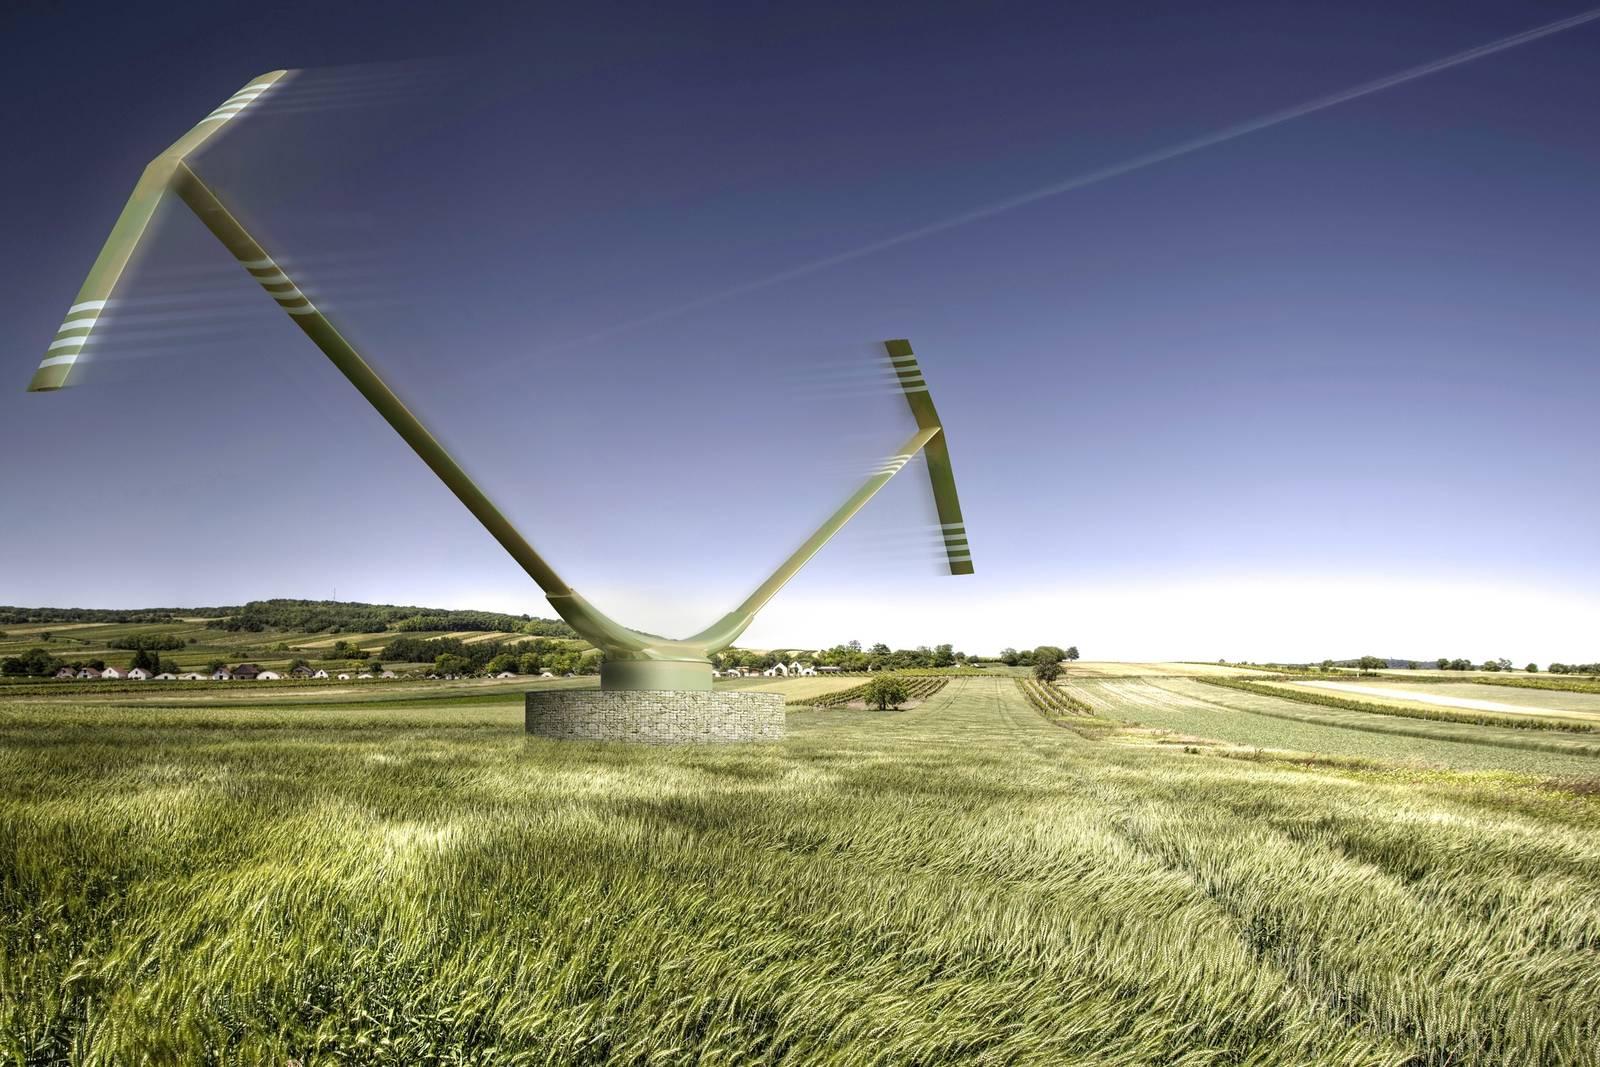 Rüzgar Türbininin Ötesi